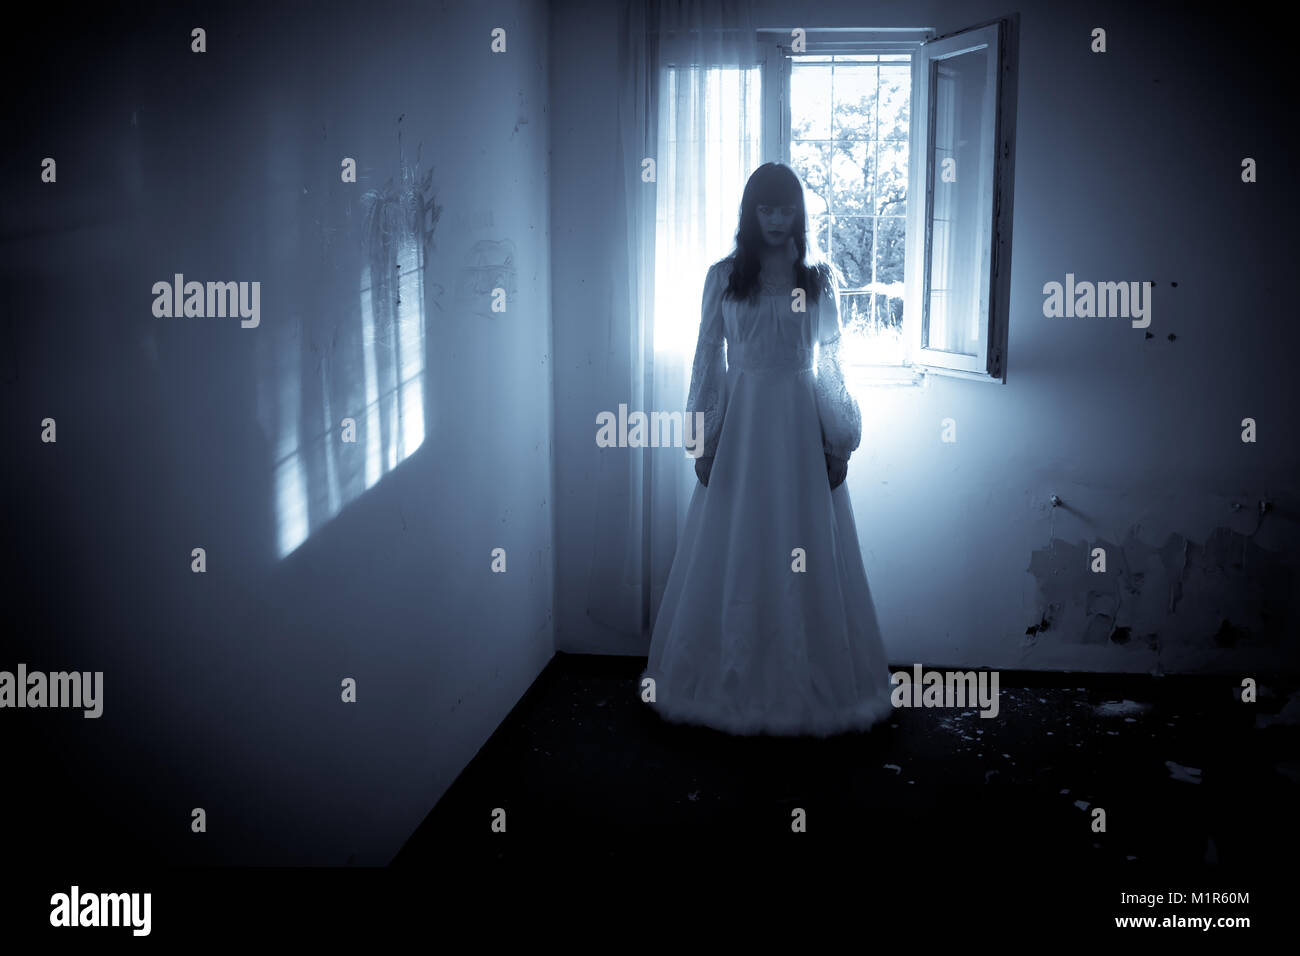 Horror Szene von einem gruseligen Frau in der Wedding Dress Stockbild